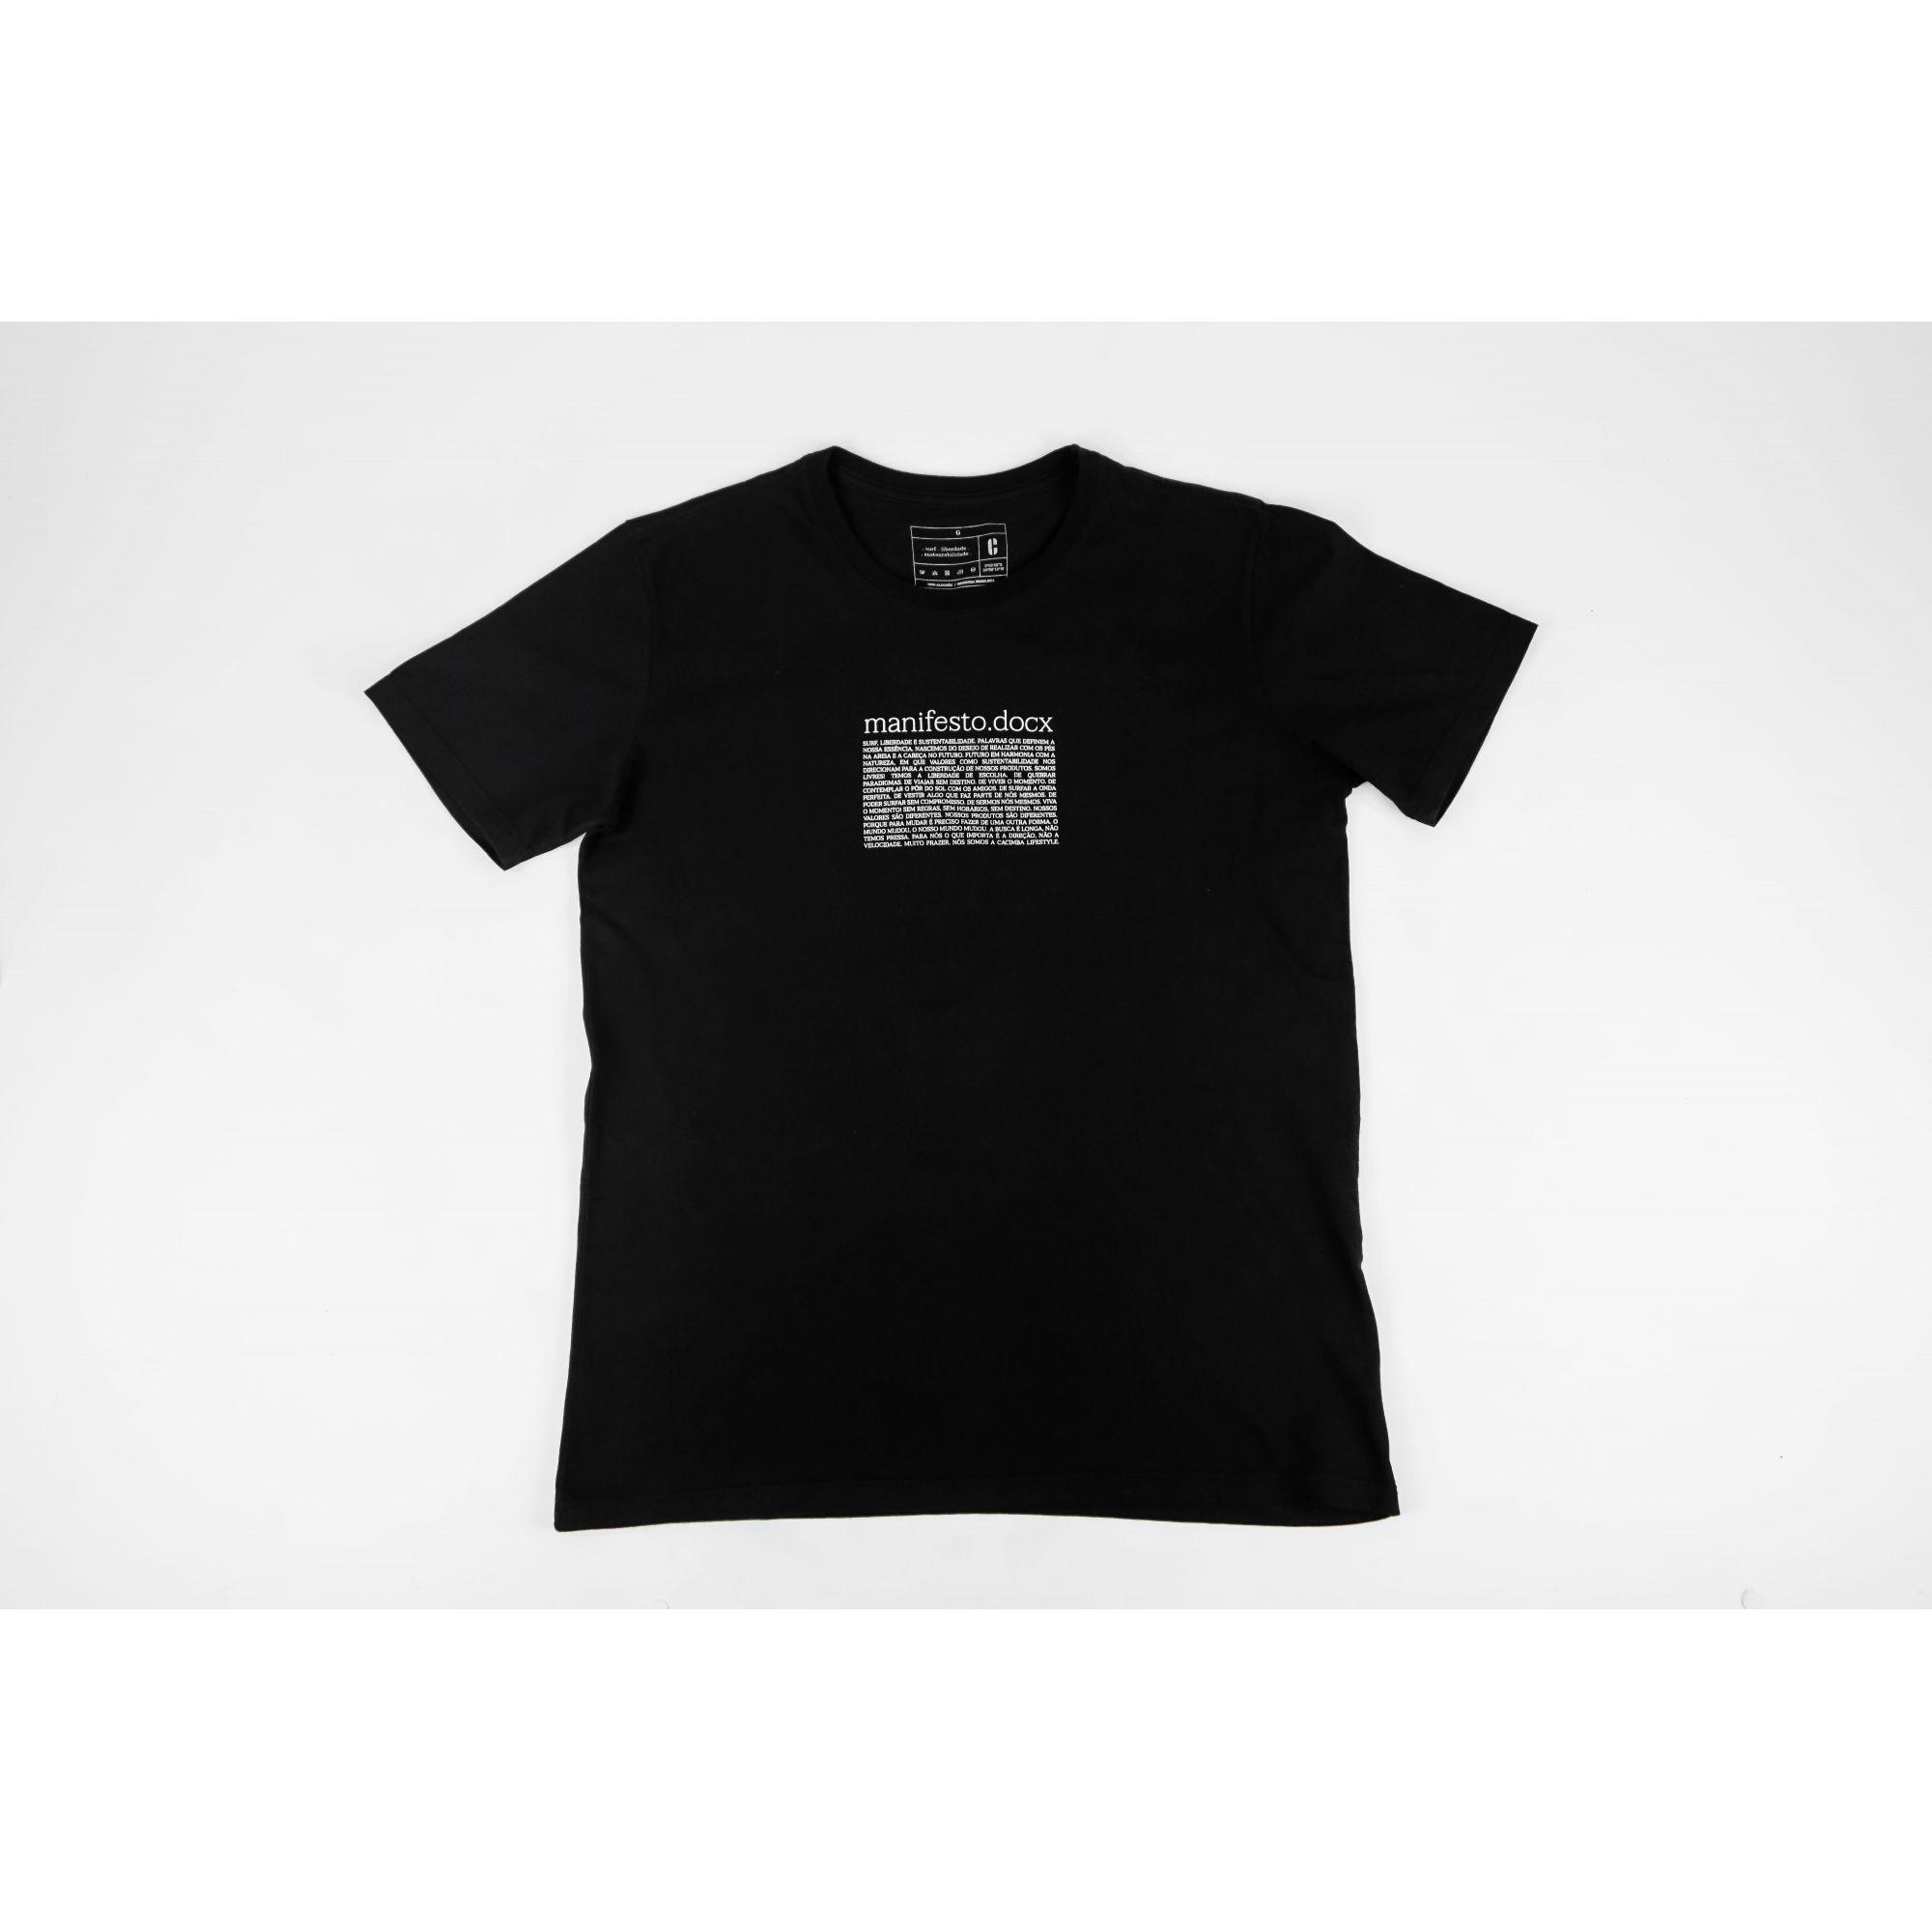 Camiseta Manifesto DocX